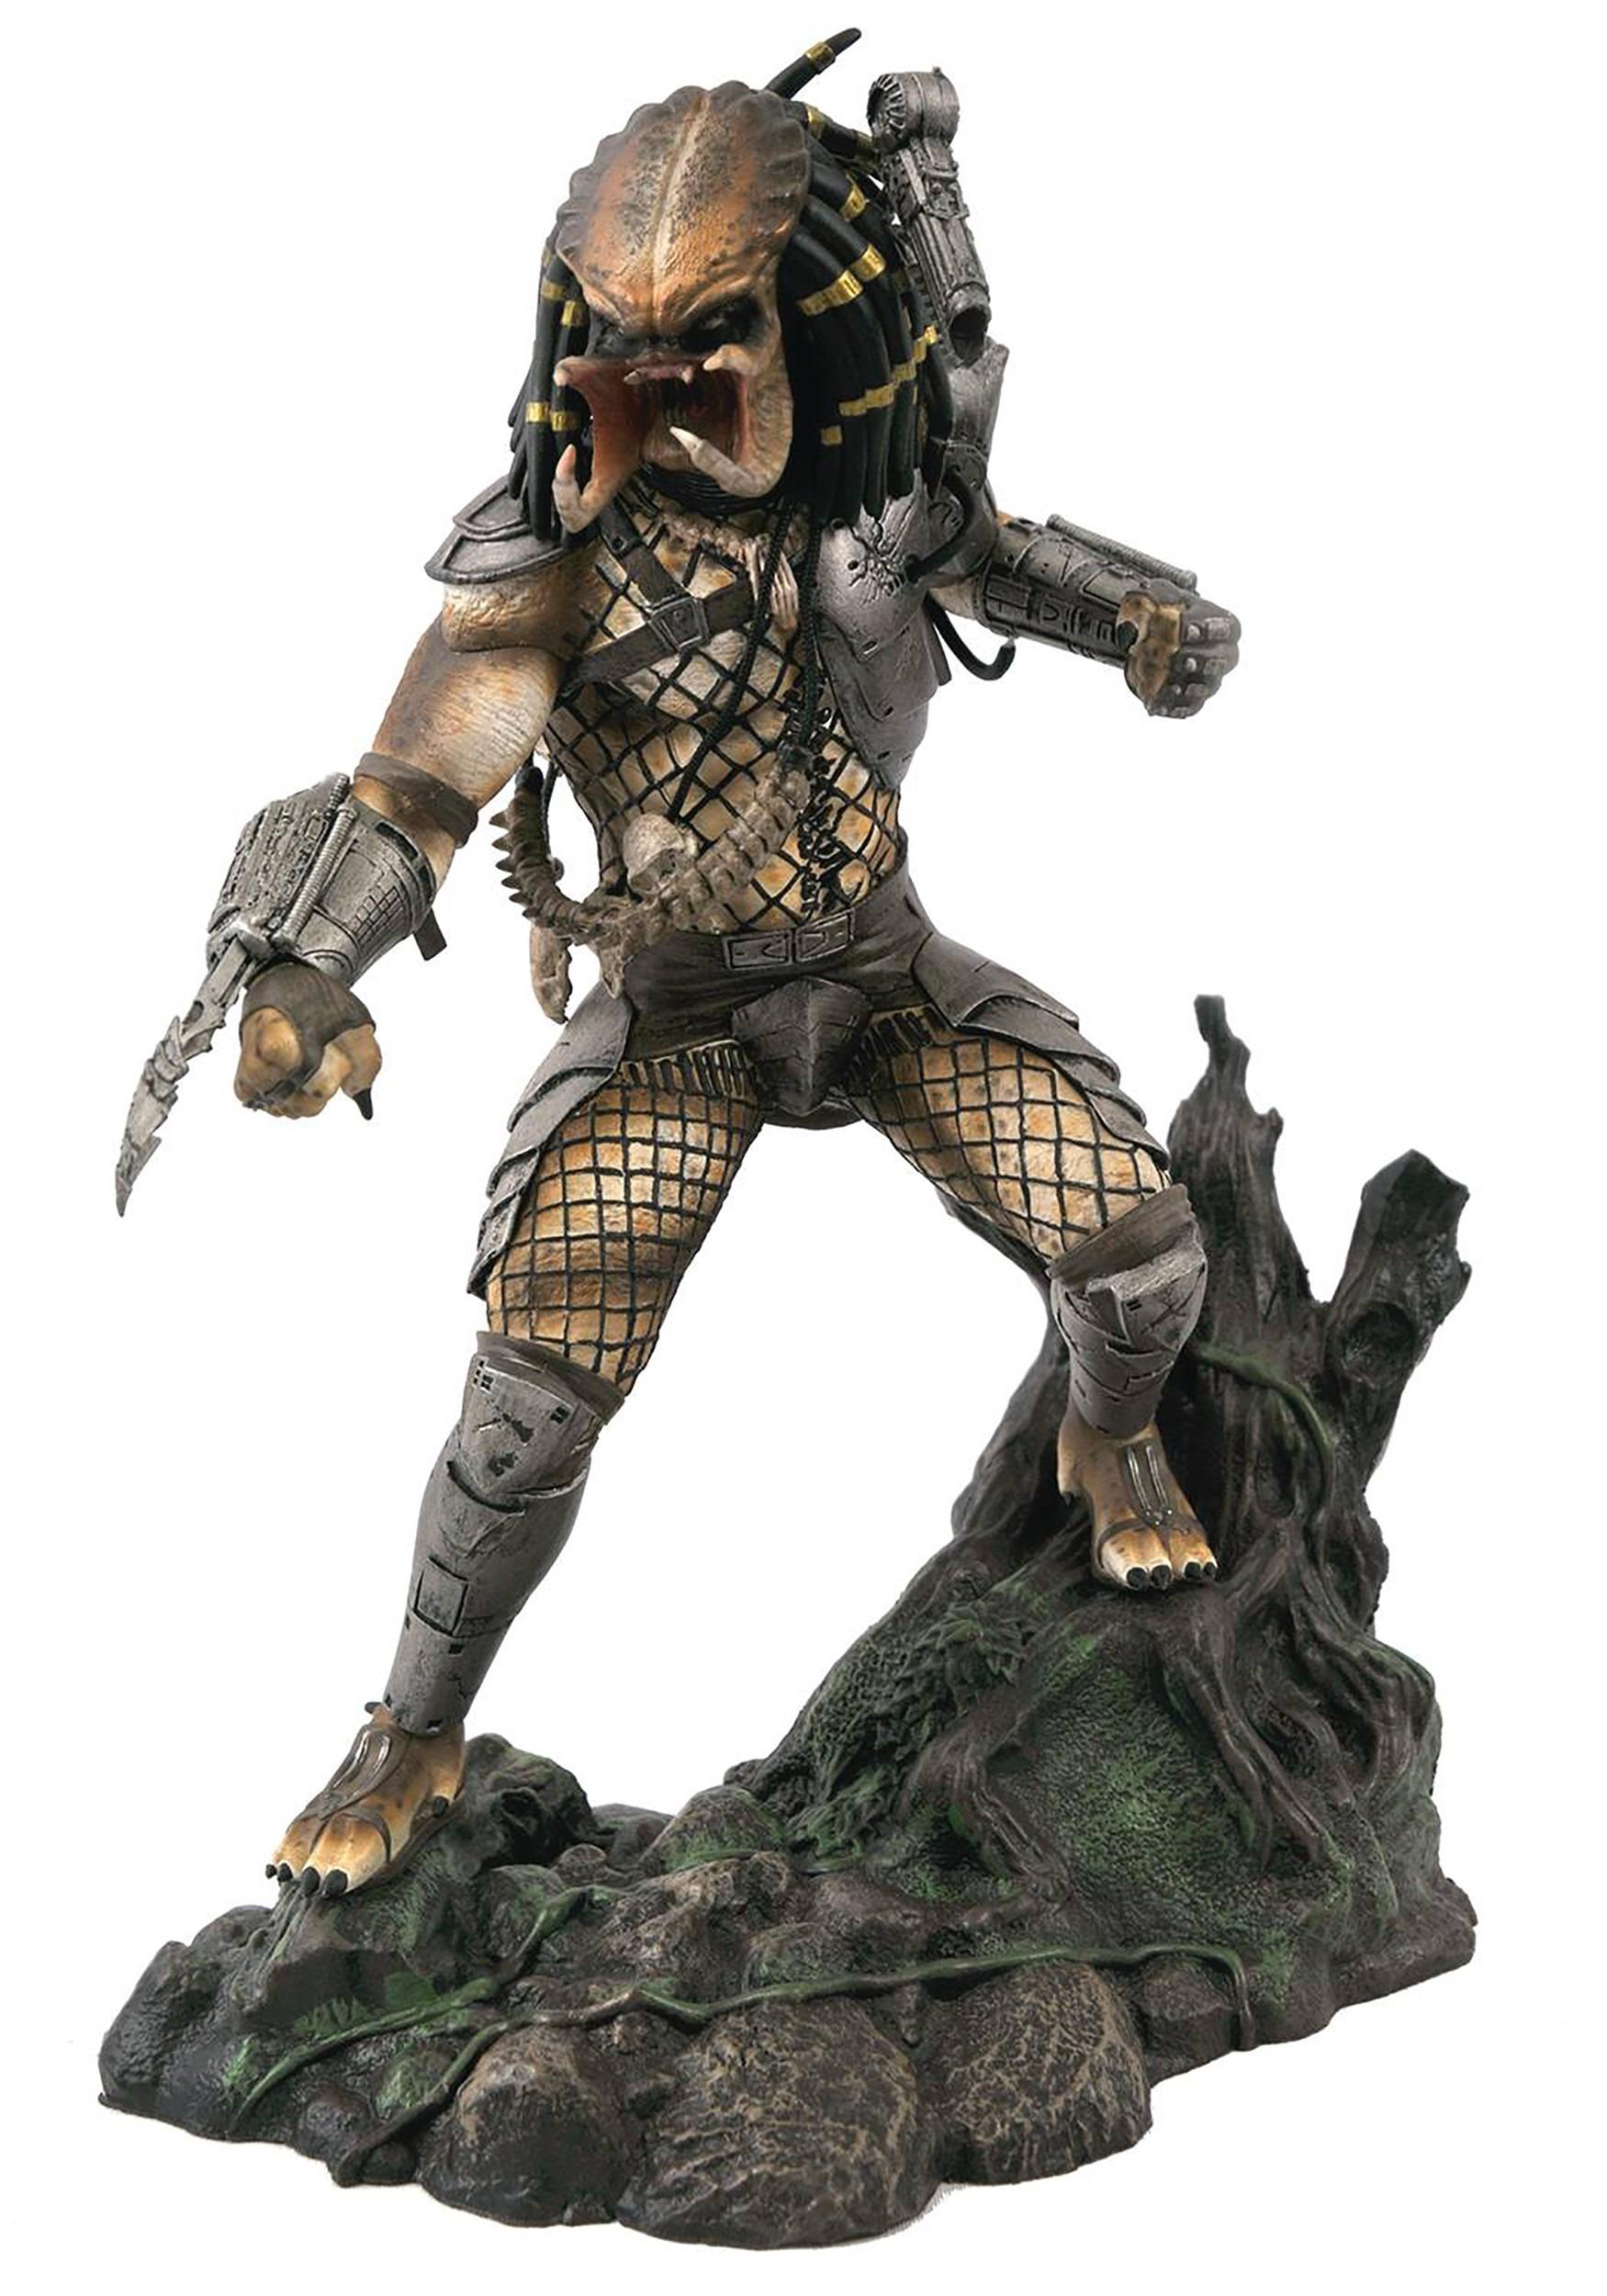 SDCC 2020 Predator, Gallery Unmasked PVC Statue